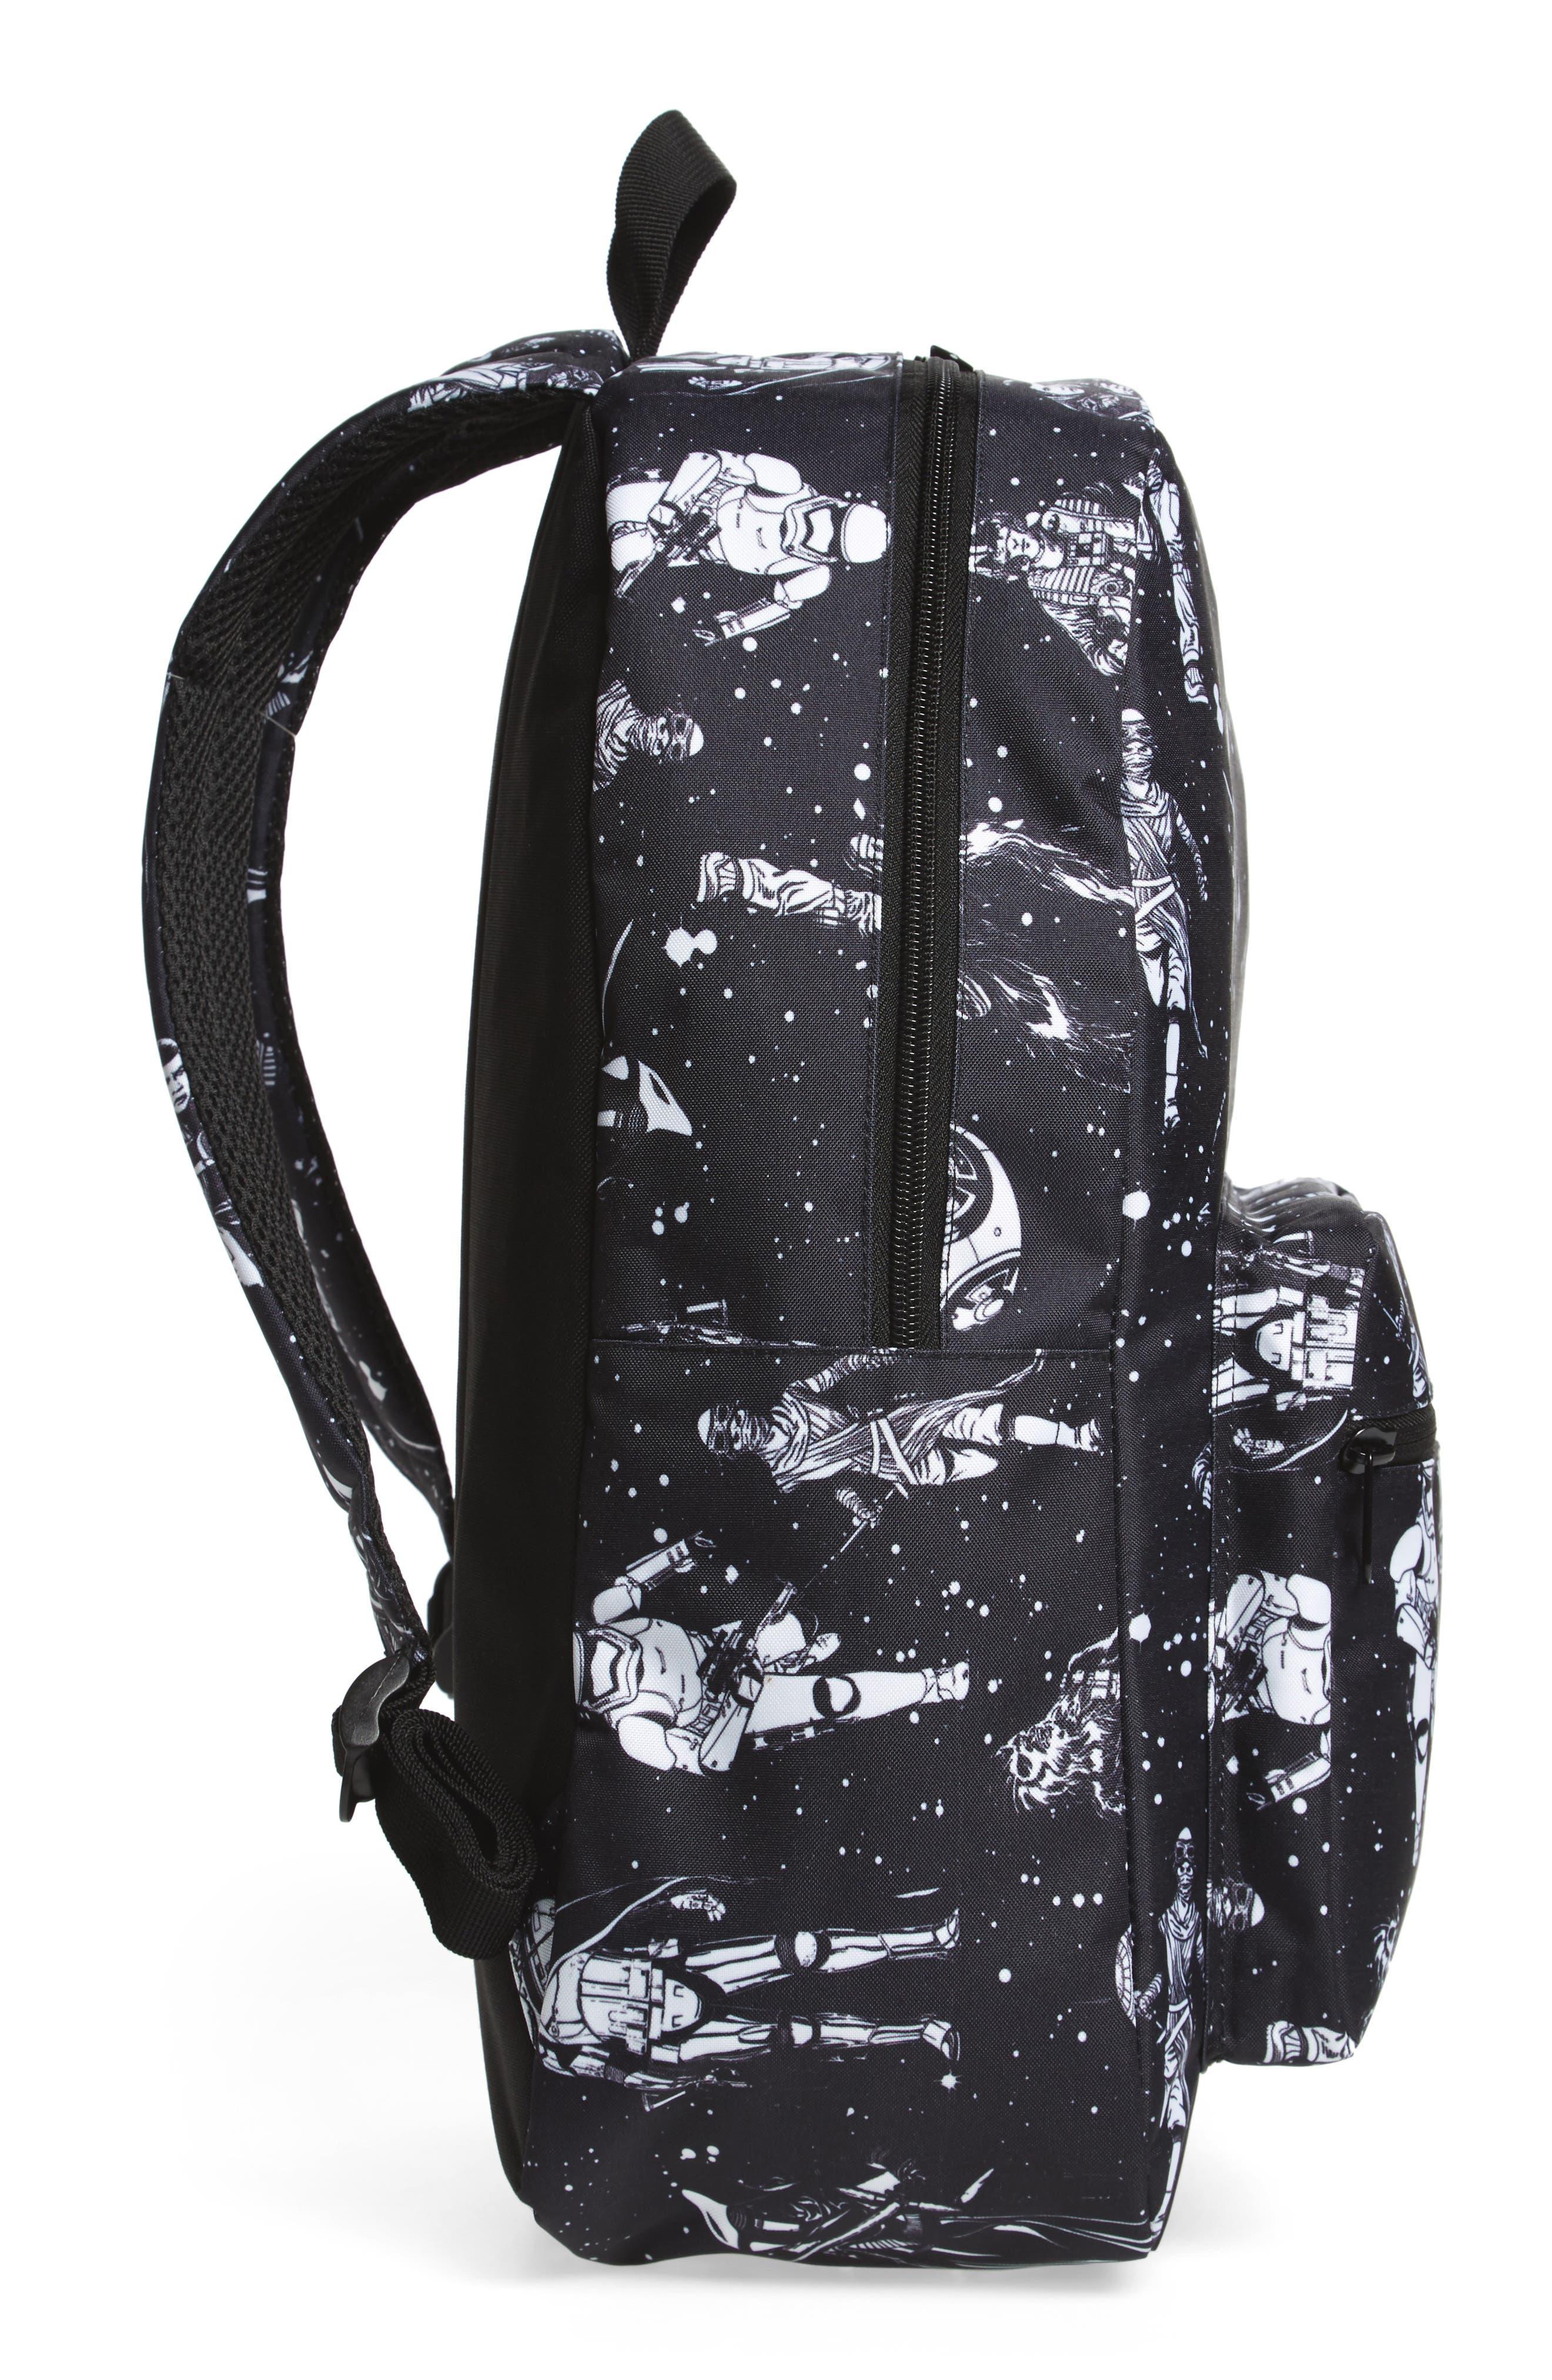 The Force Awakens Black & White Space Backpack,                             Alternate thumbnail 4, color,                             001